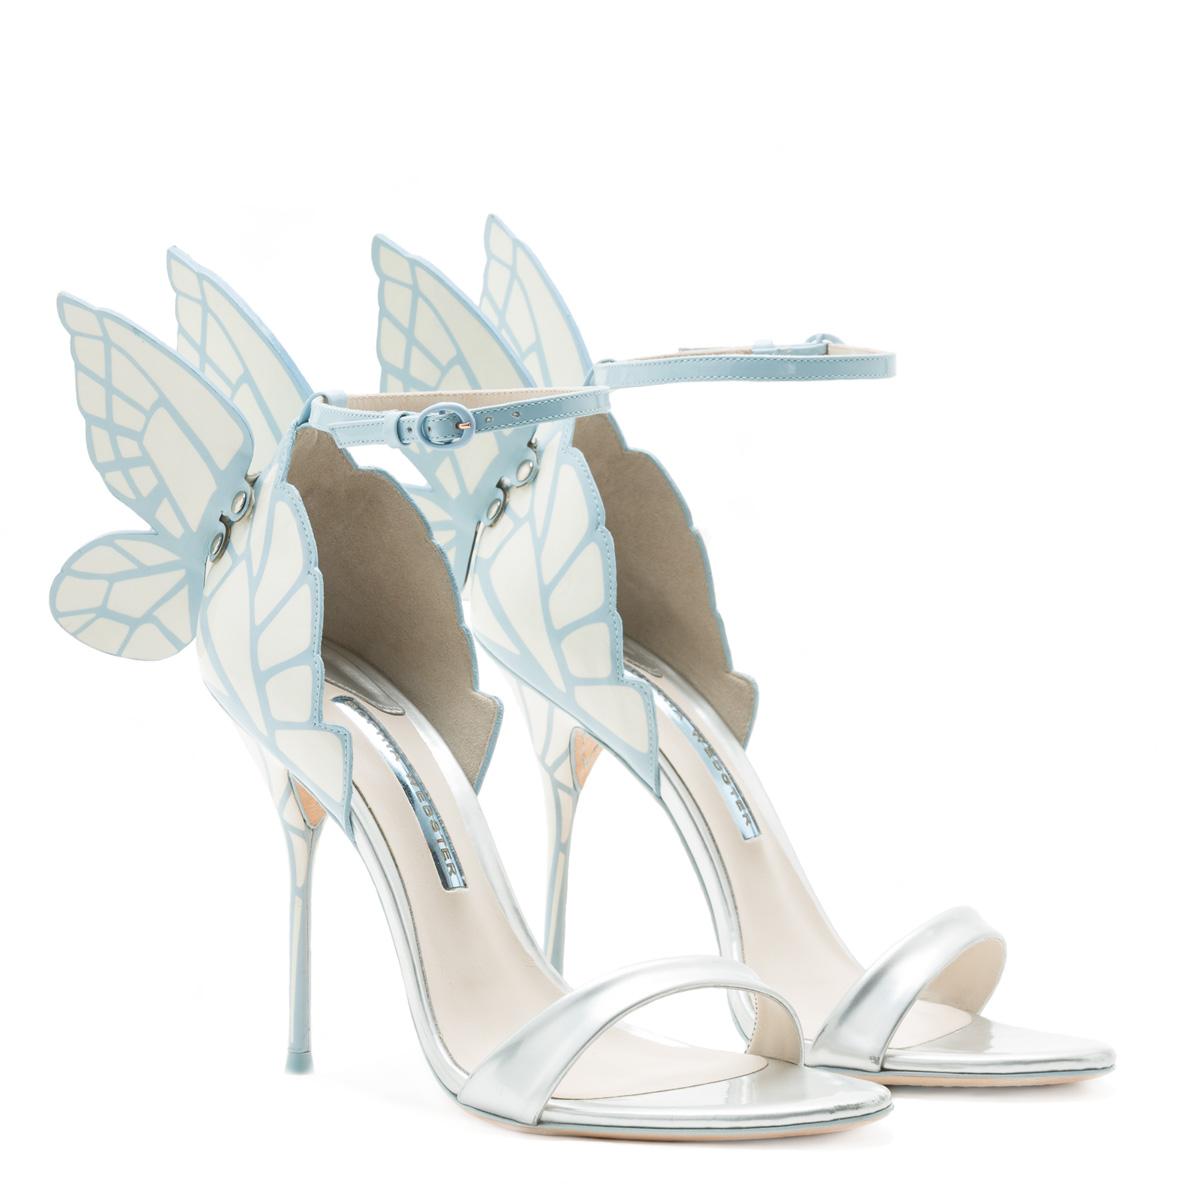 sophia webster bridal shoes photo - 1